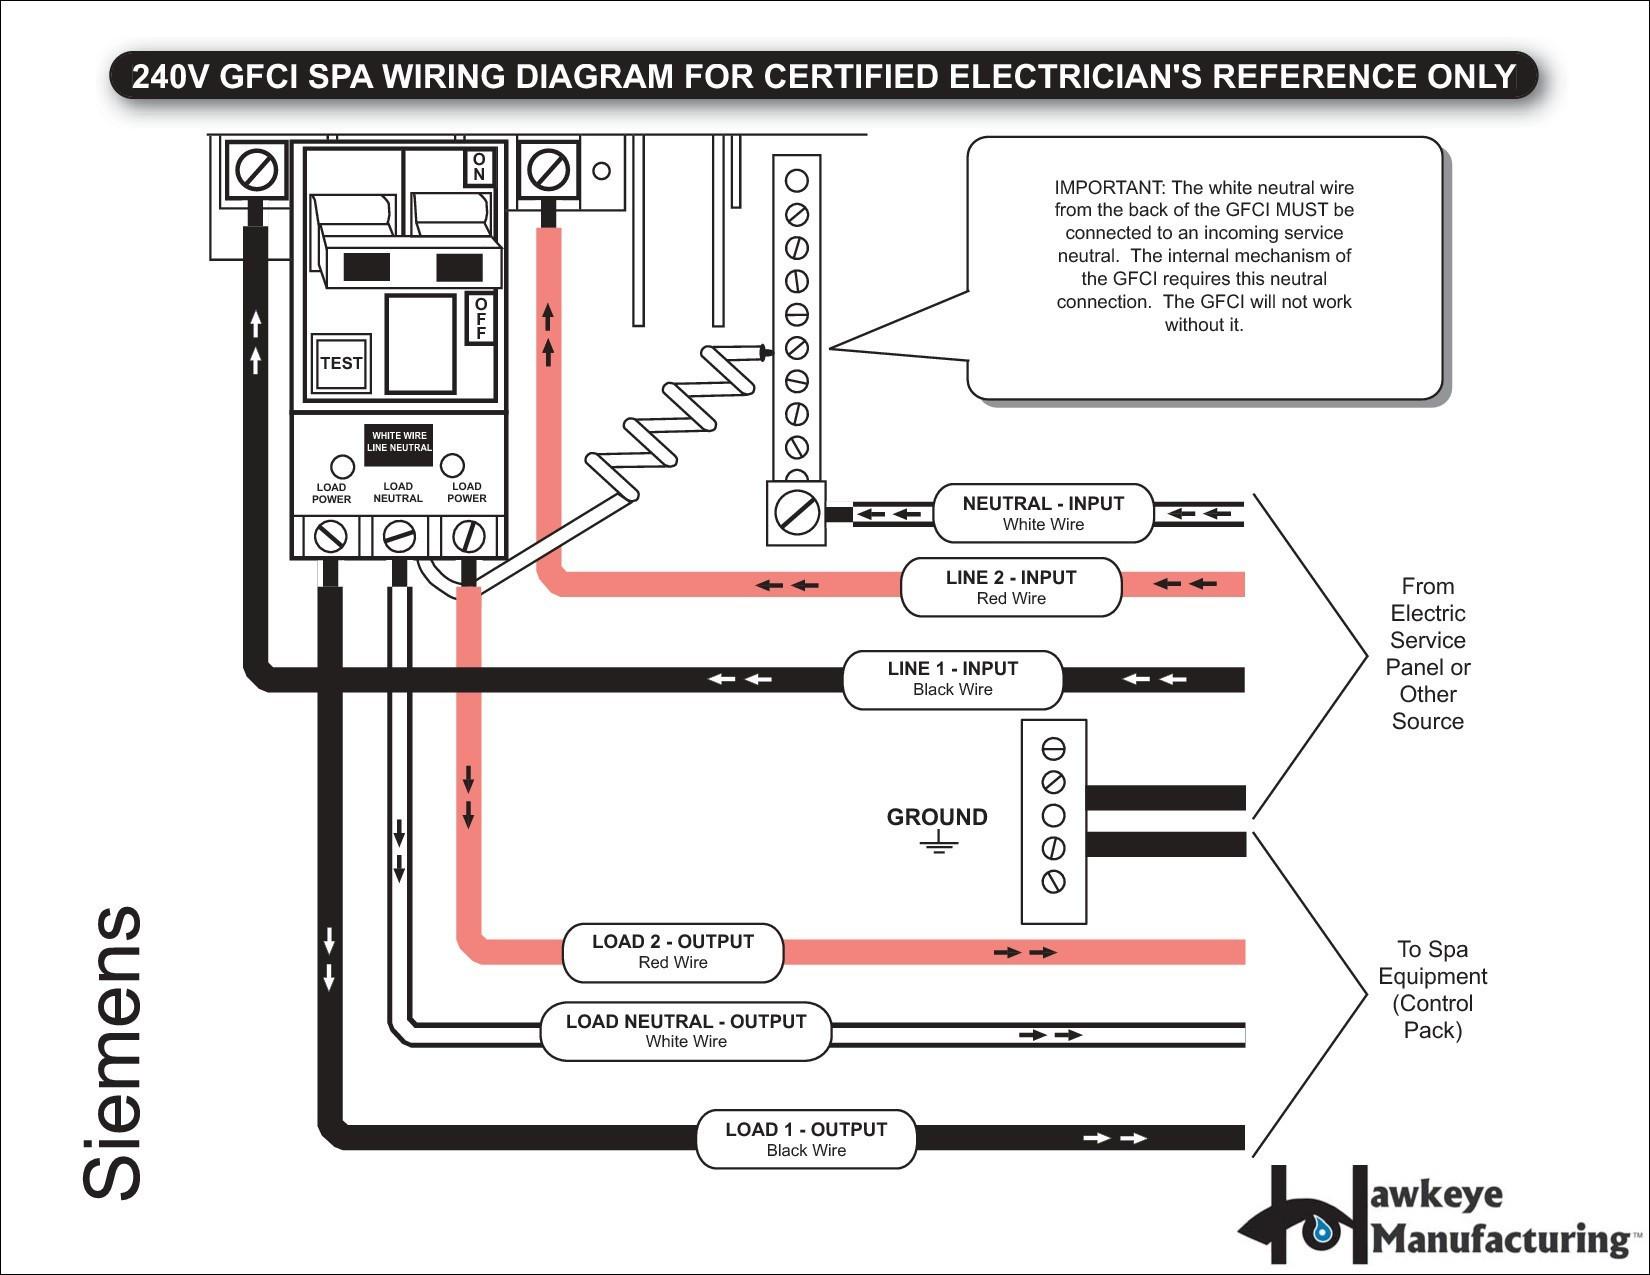 Wiring Diagram Gfci Breaker Save Wiring Diagram Gfci Outlet Valid 2 Pole Gfci Breaker Wiring Diagram